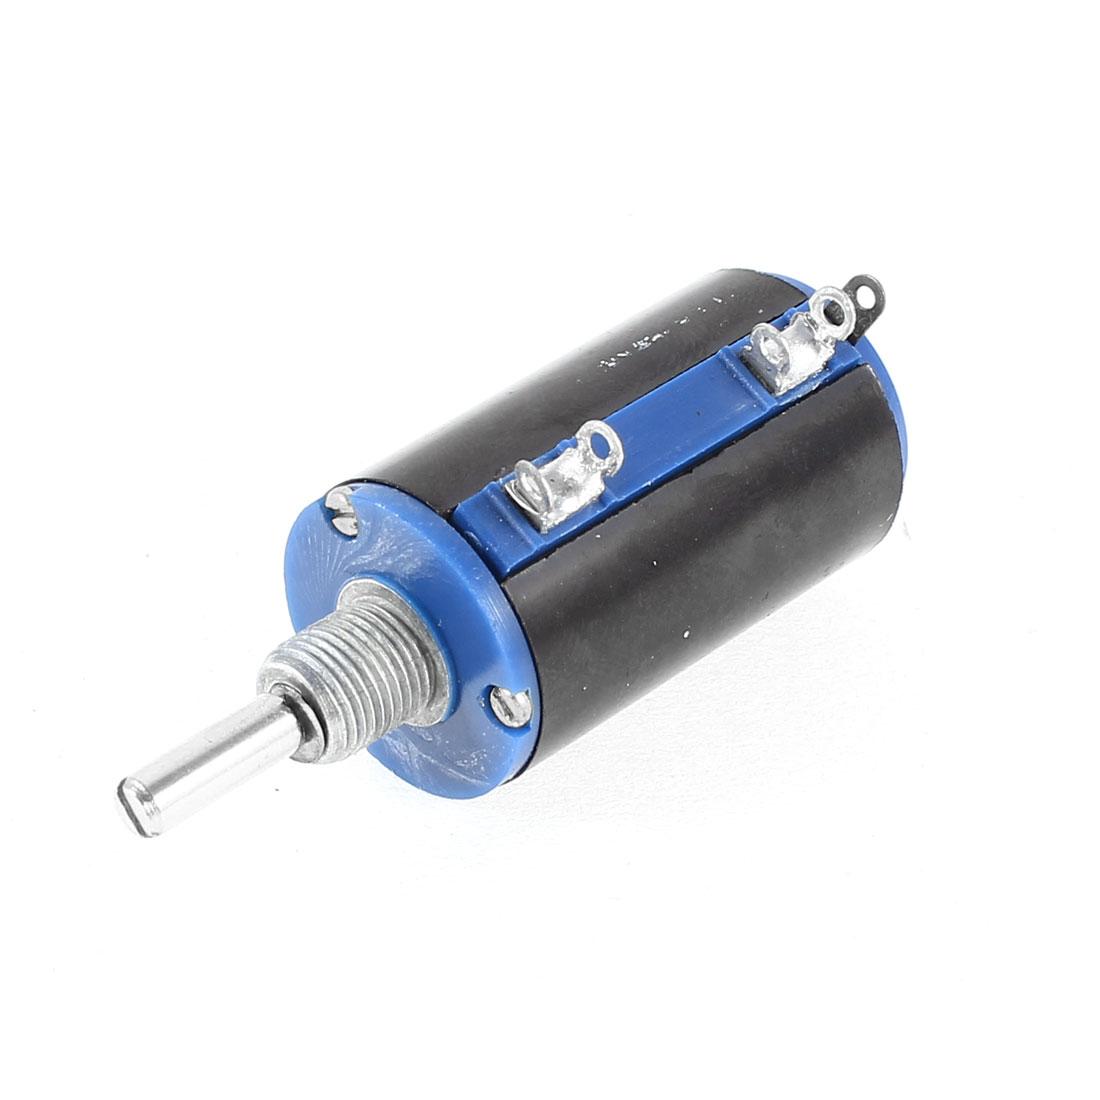 WXD3-13-2W 22K Ohm 5% Tolerance 2W 38 x 21mm Multi Turn 3 Terminals Rotary Wire Wound Potentiometer